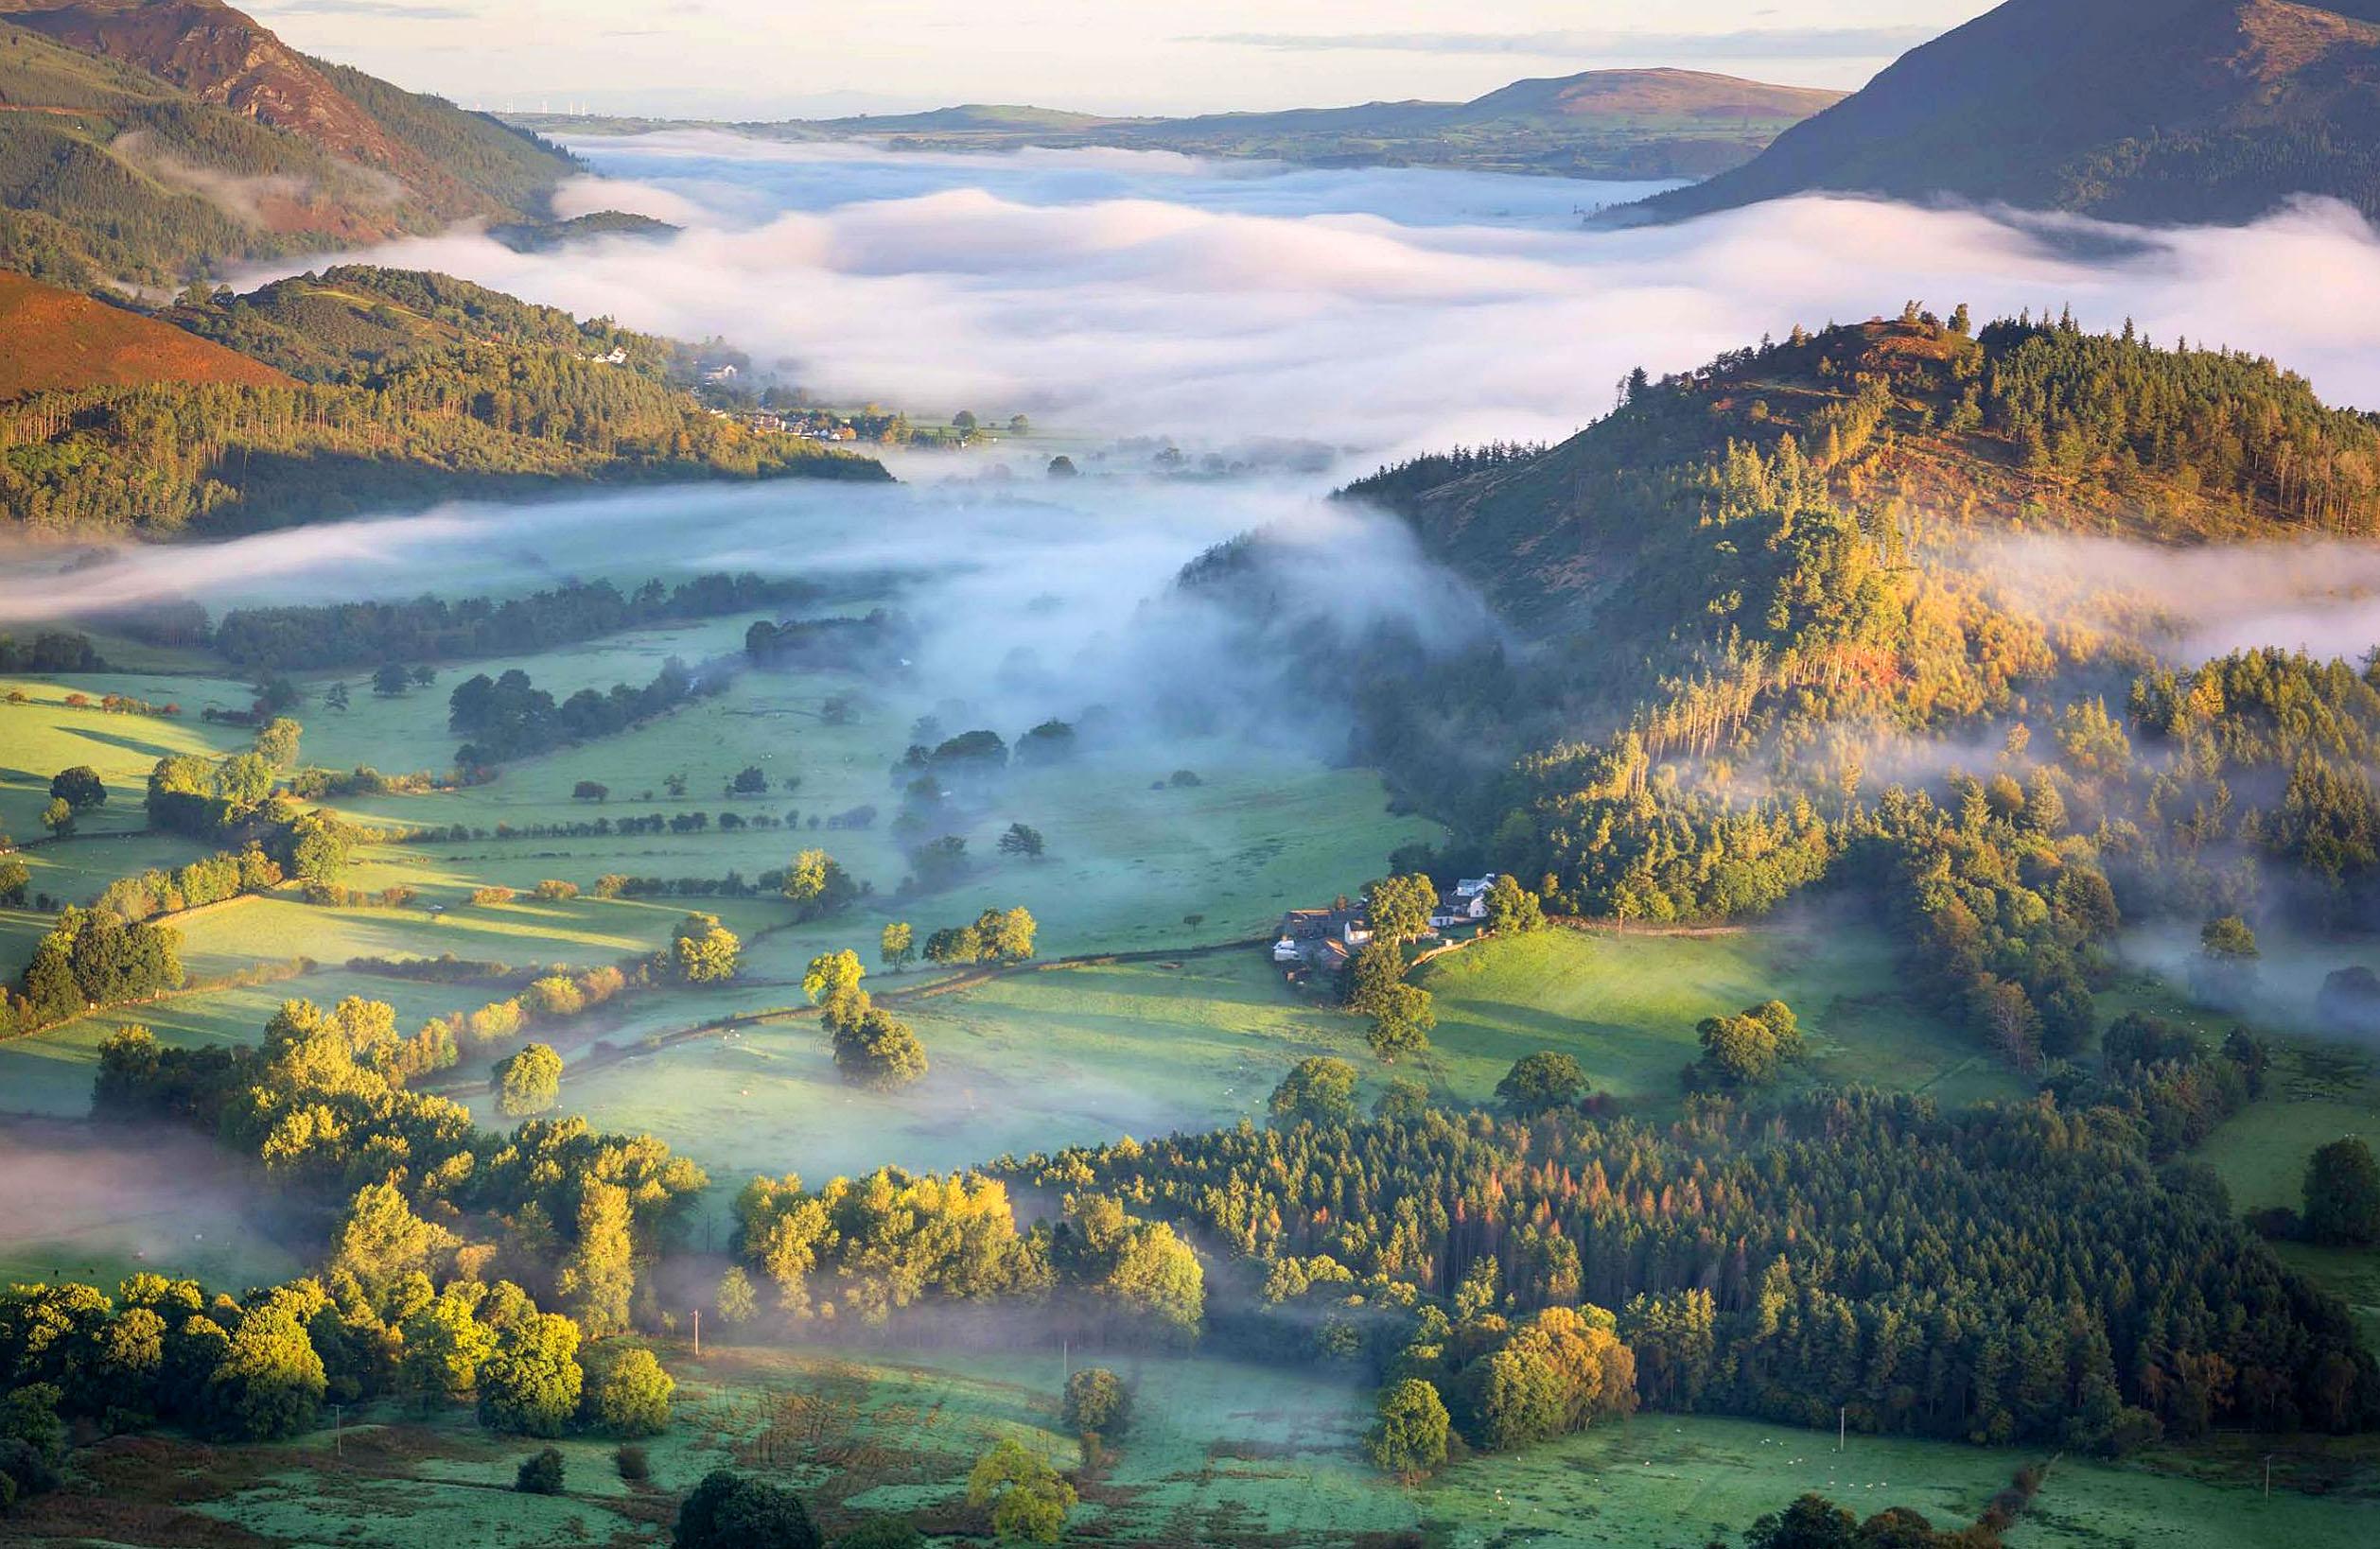 Newlands Valley, Swinside and Bassenthwaite at dawn, Lake District by Stewart Smith.jpg